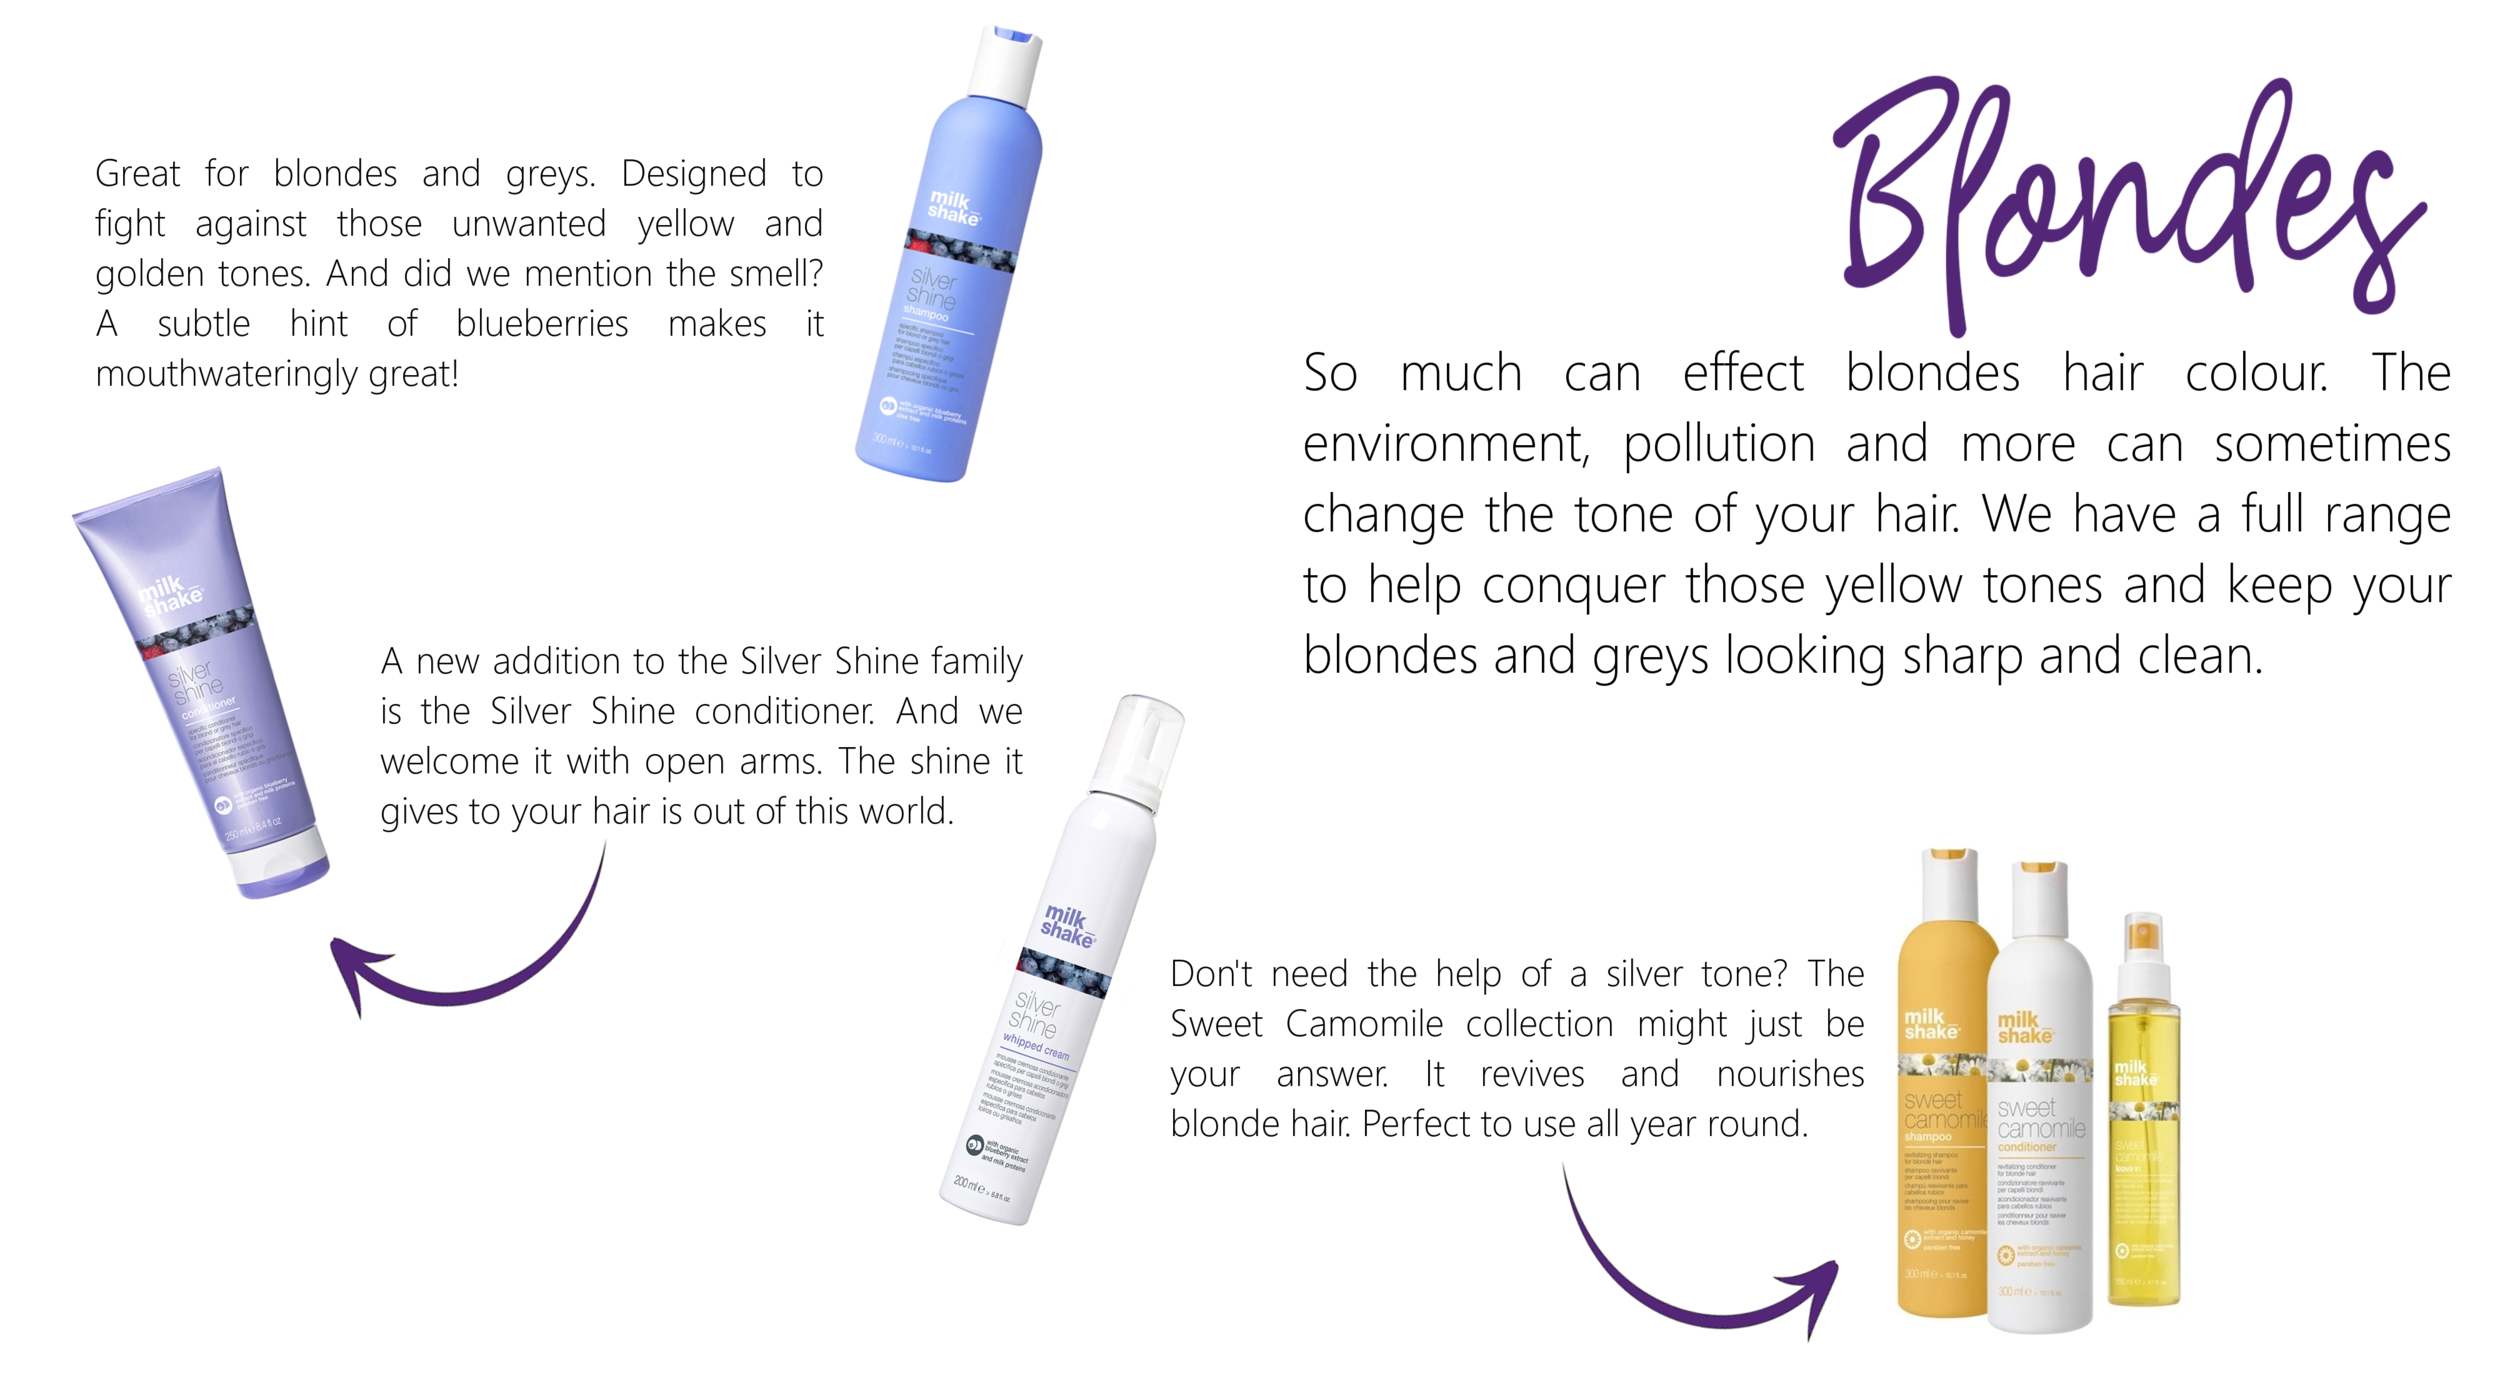 Venus-Beauty-Hair-Tavistock-Devon-Salon-Shampoo-Conditioner-Duos-Blonde-Silver-Shine-Milkshake-Hair-Care.png